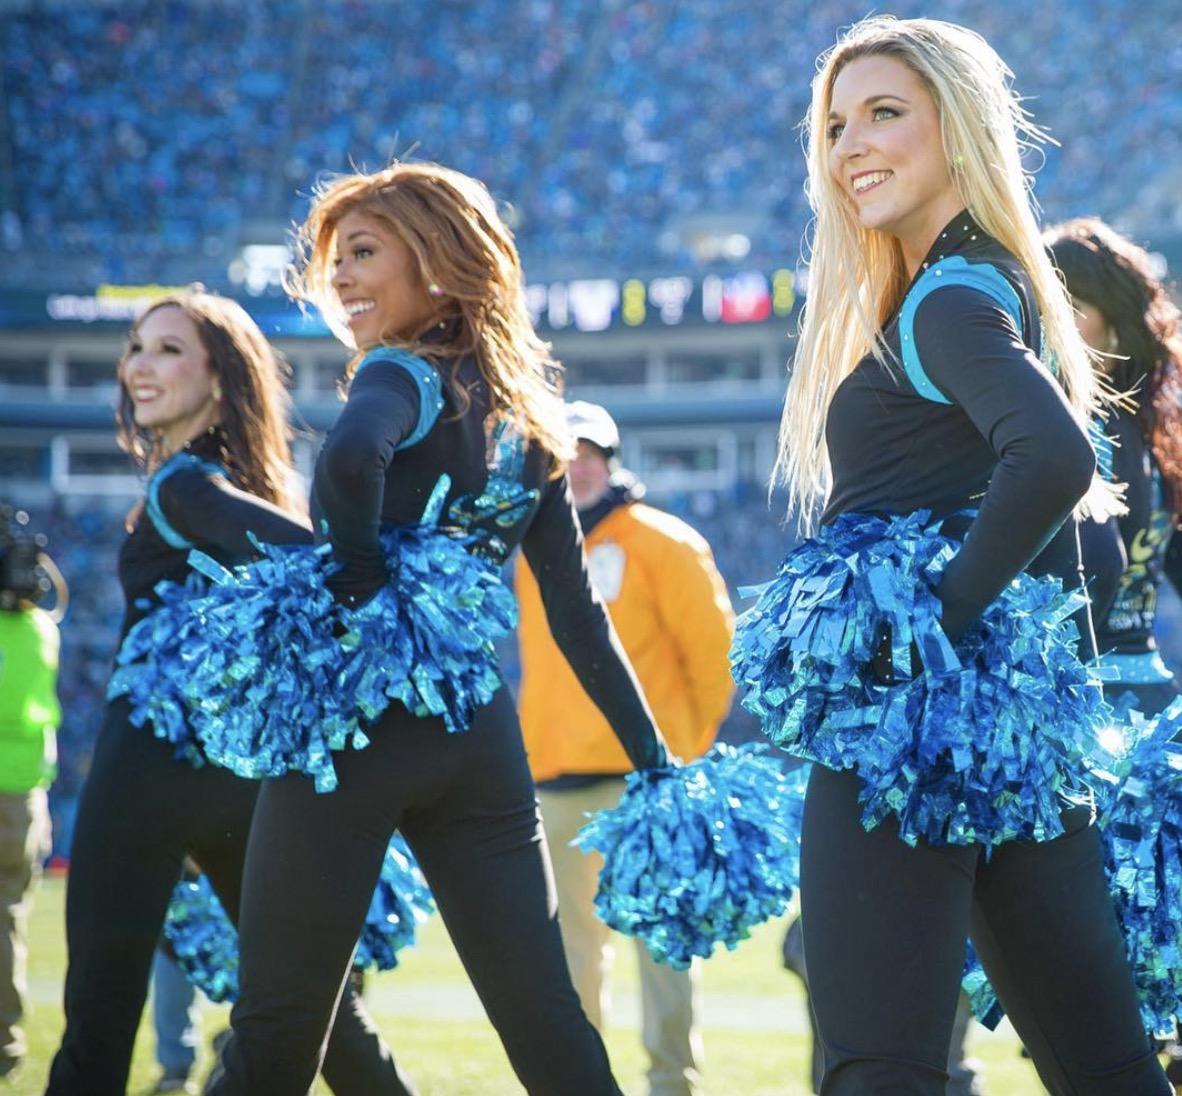 Panthers cheerleaders Nude Photos 21